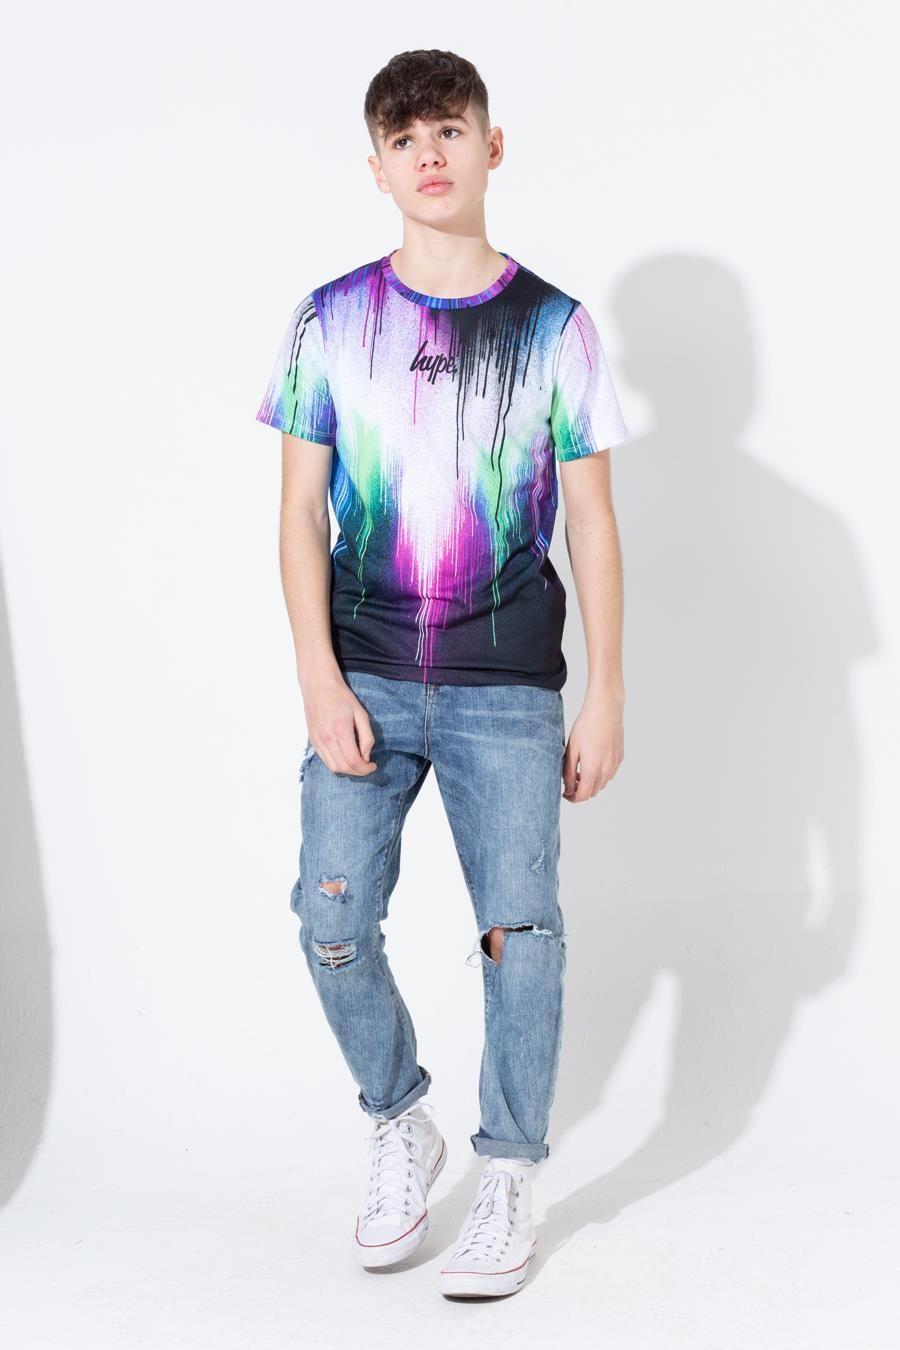 Hype Iris Drips Kids T-Shirt